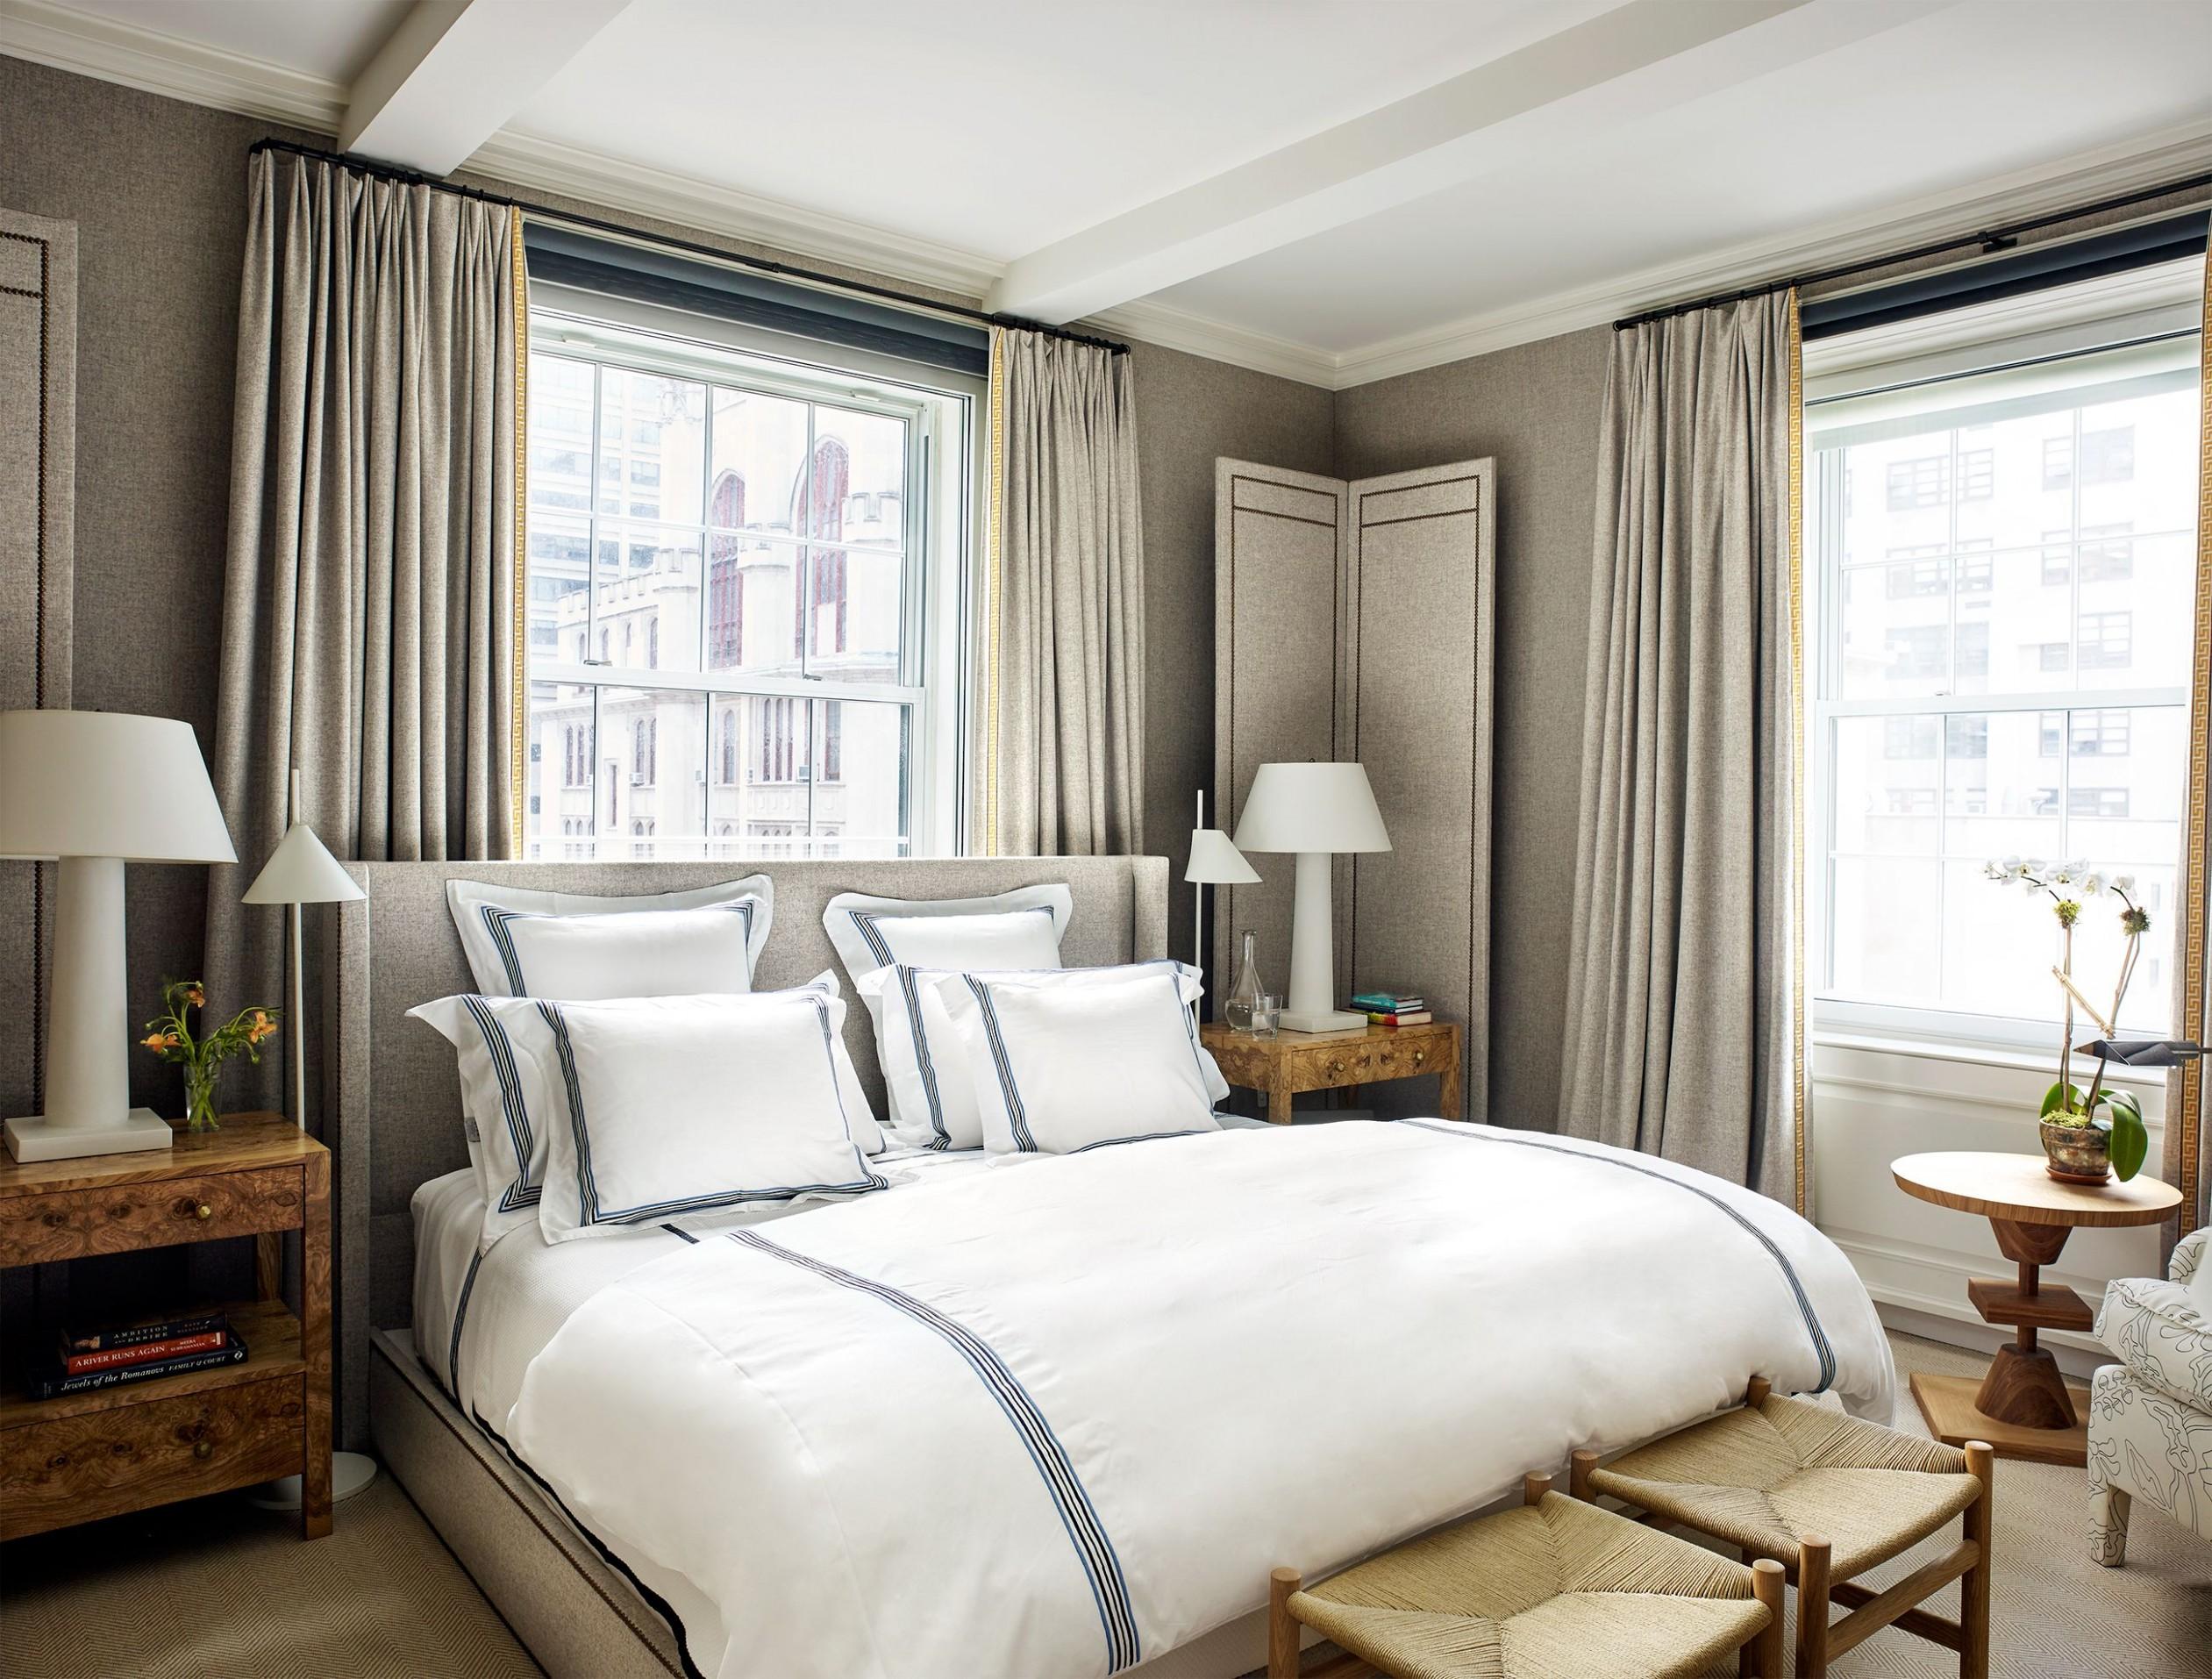 Best Bedroom Curtains - Ideas for Bedroom Window Treatments - Window Ideas Bedroom